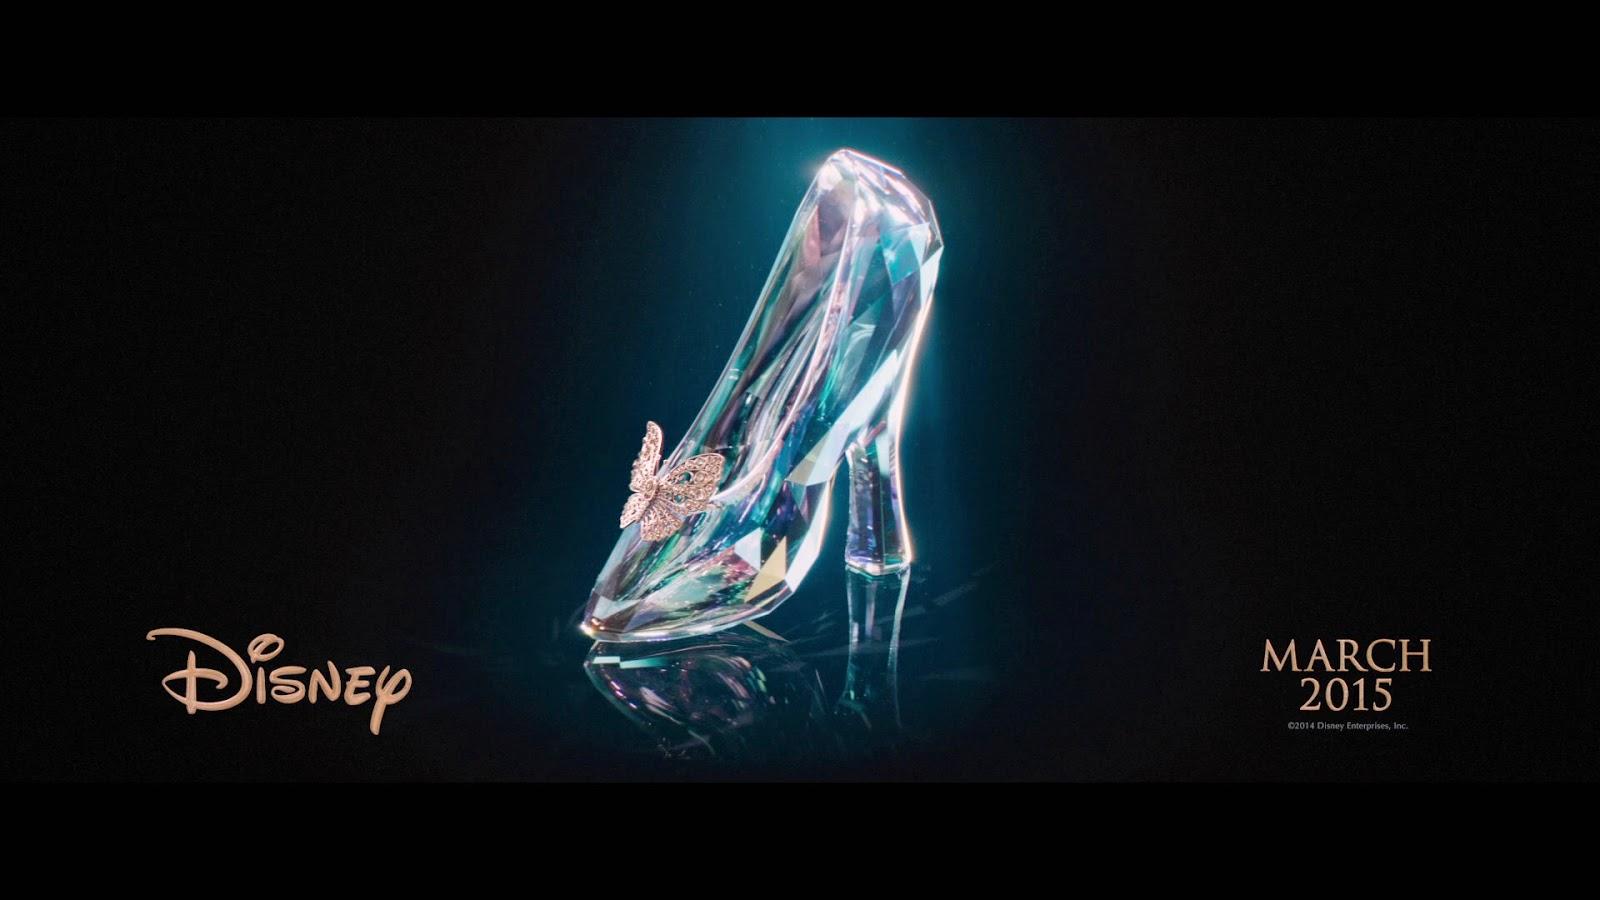 Cinderella 2015 poster filmprincesses.flmiinspector.com